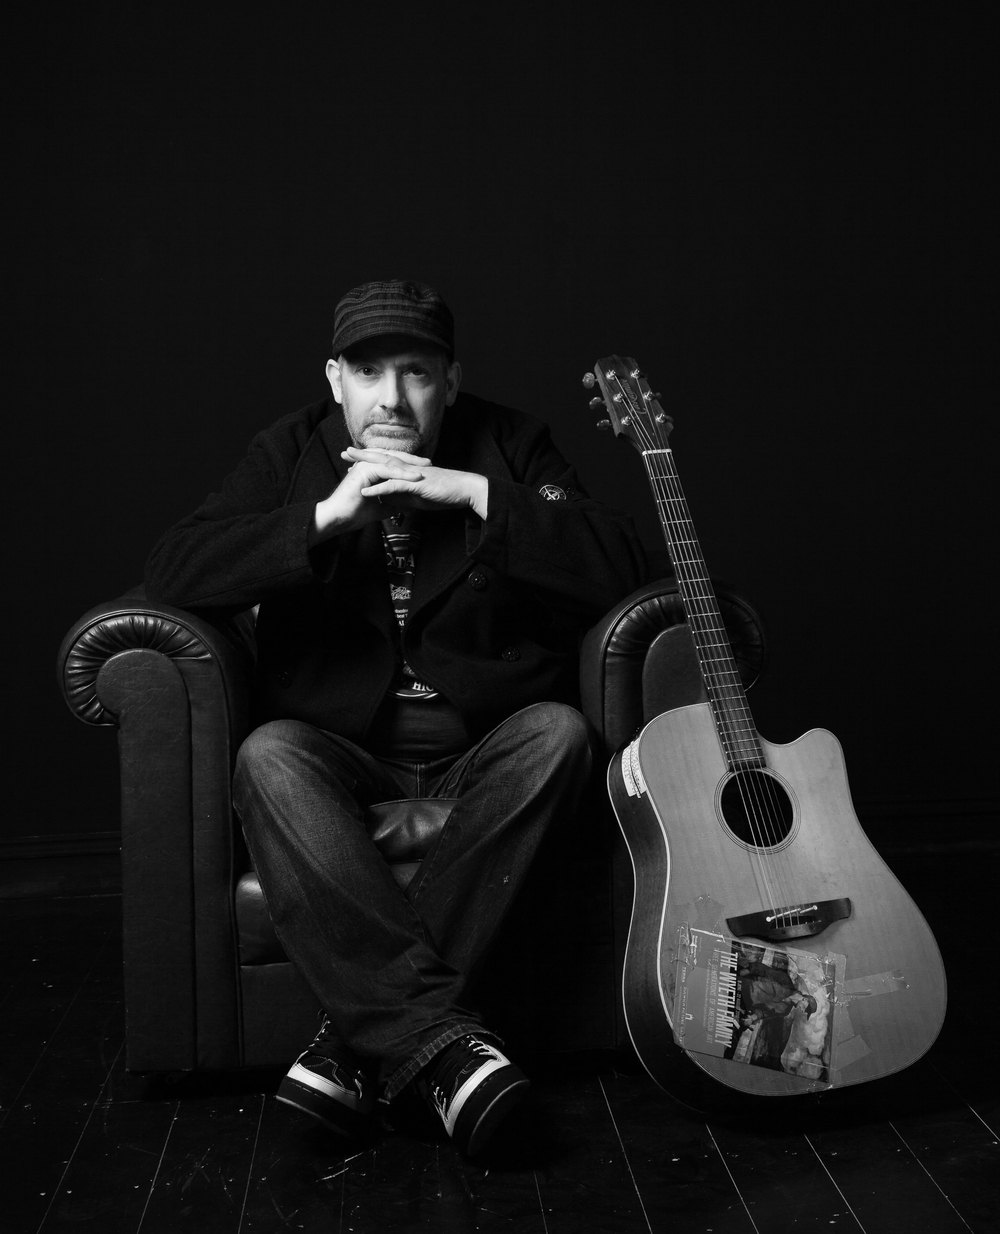 Dave Rotheray - musician headshot